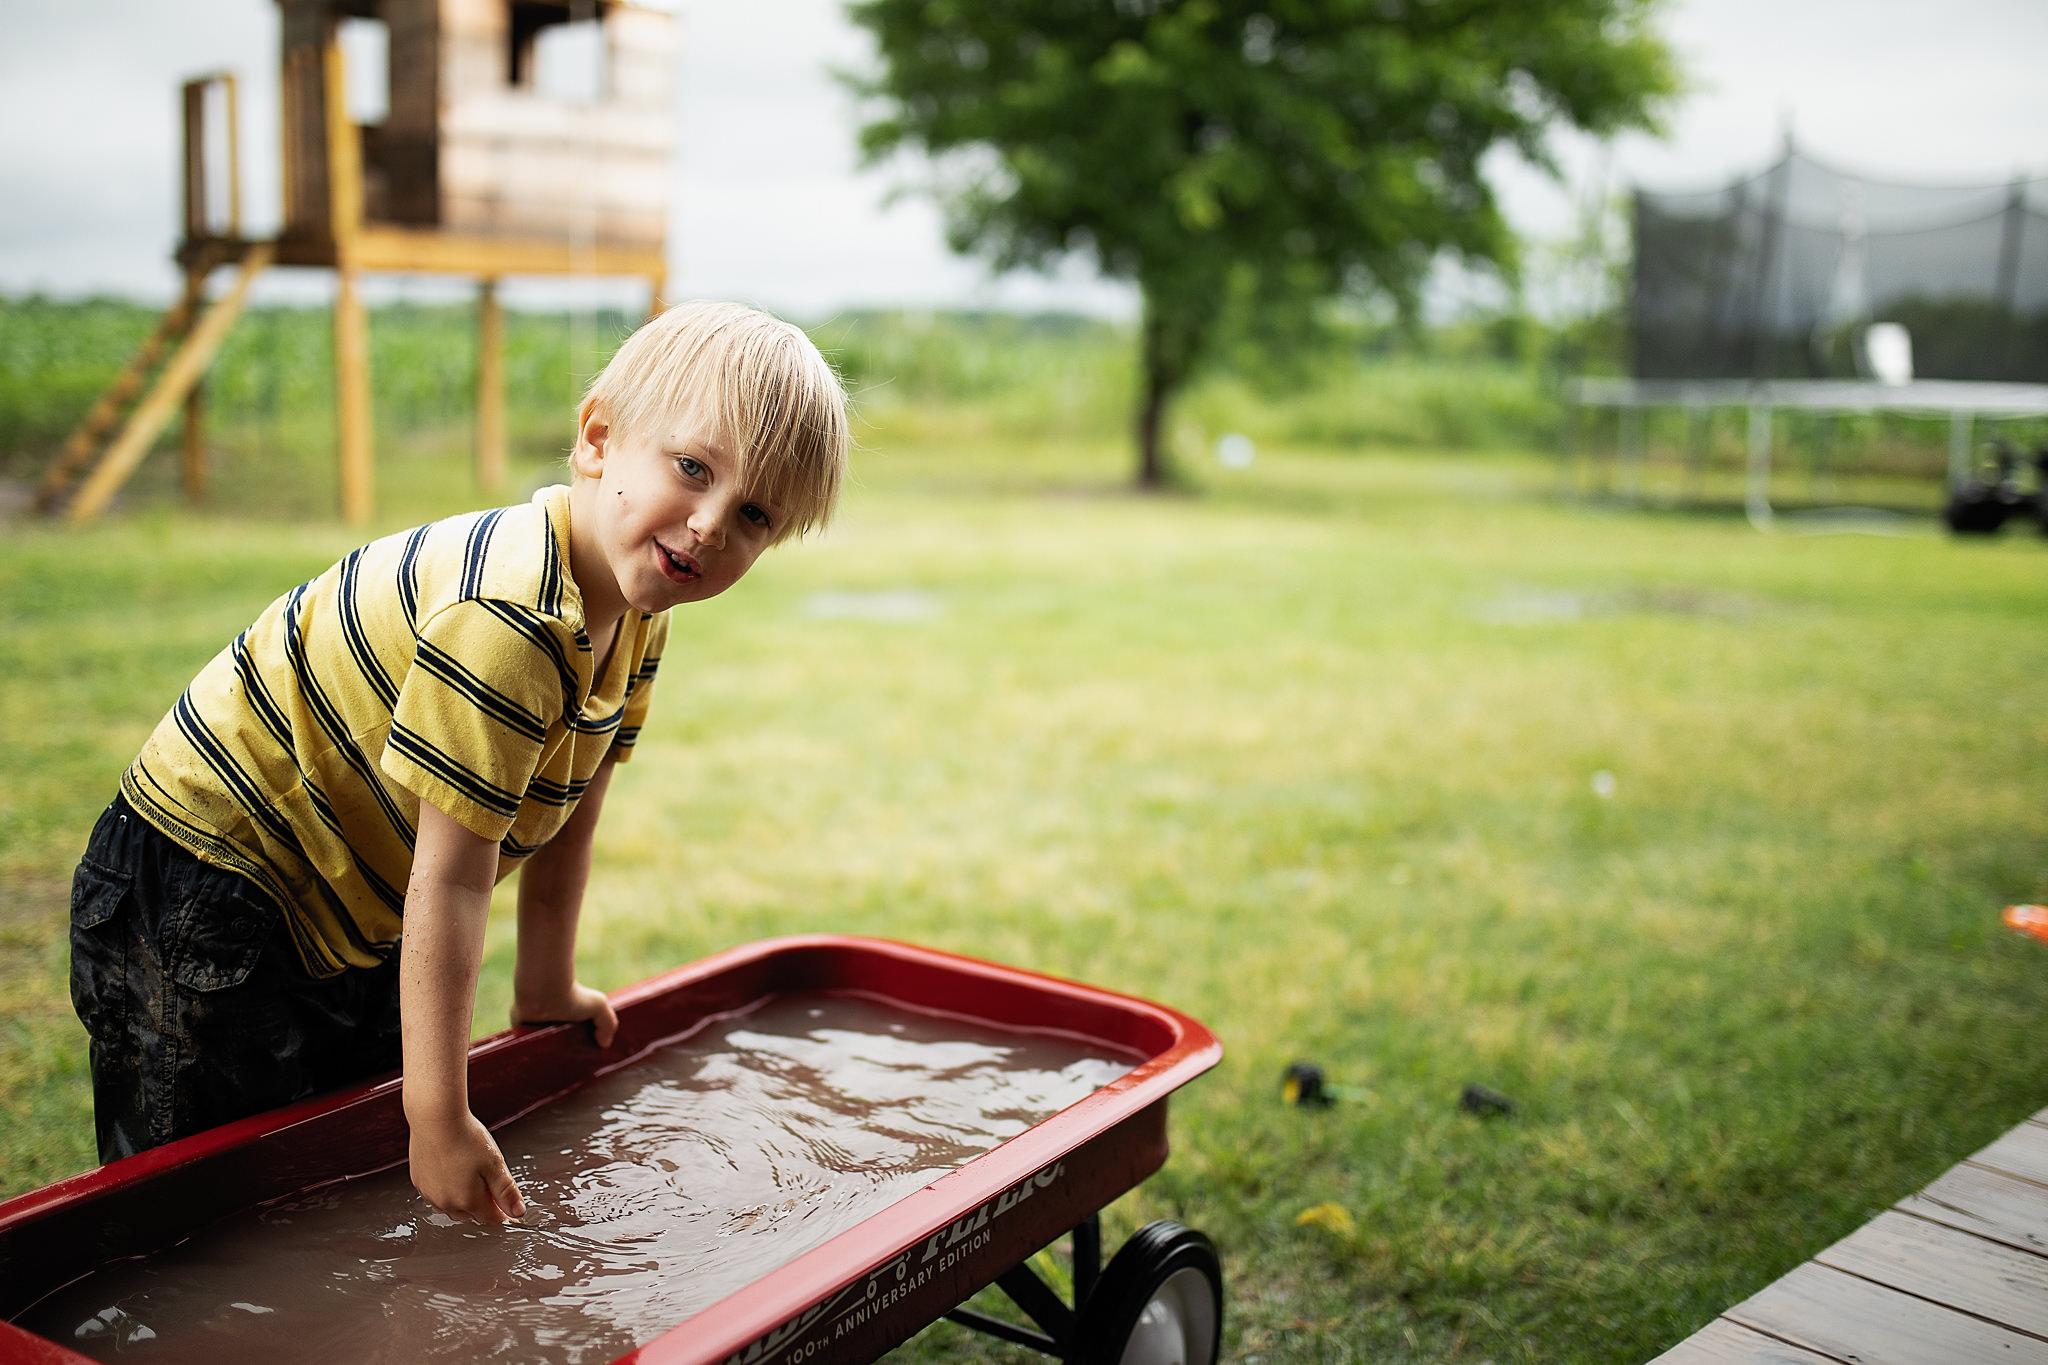 muddy-spring-day-rural-life-photography05.jpg